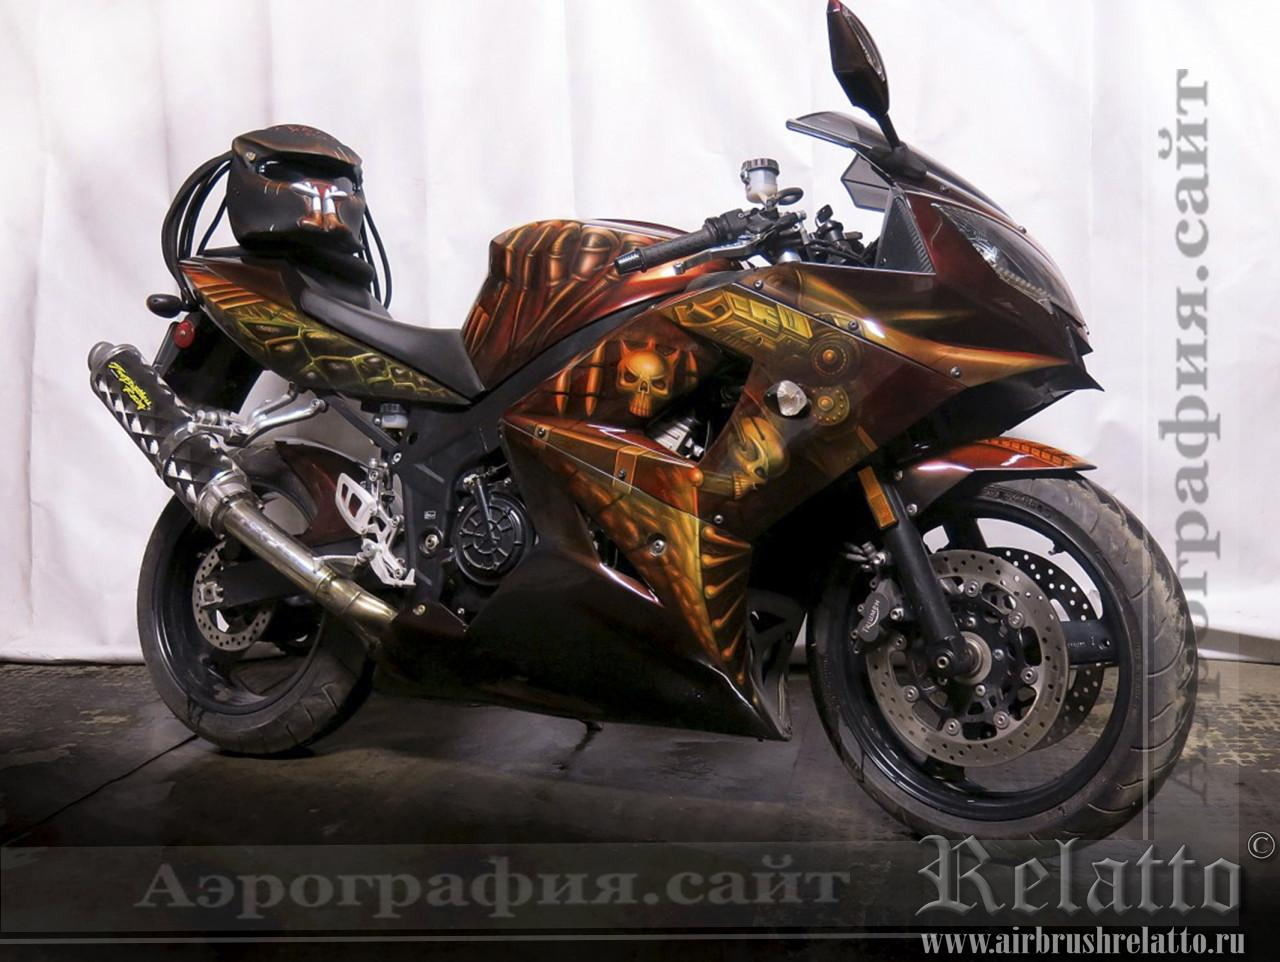 аэрография на мотоцикле Triumph Хищник Predator airbrush